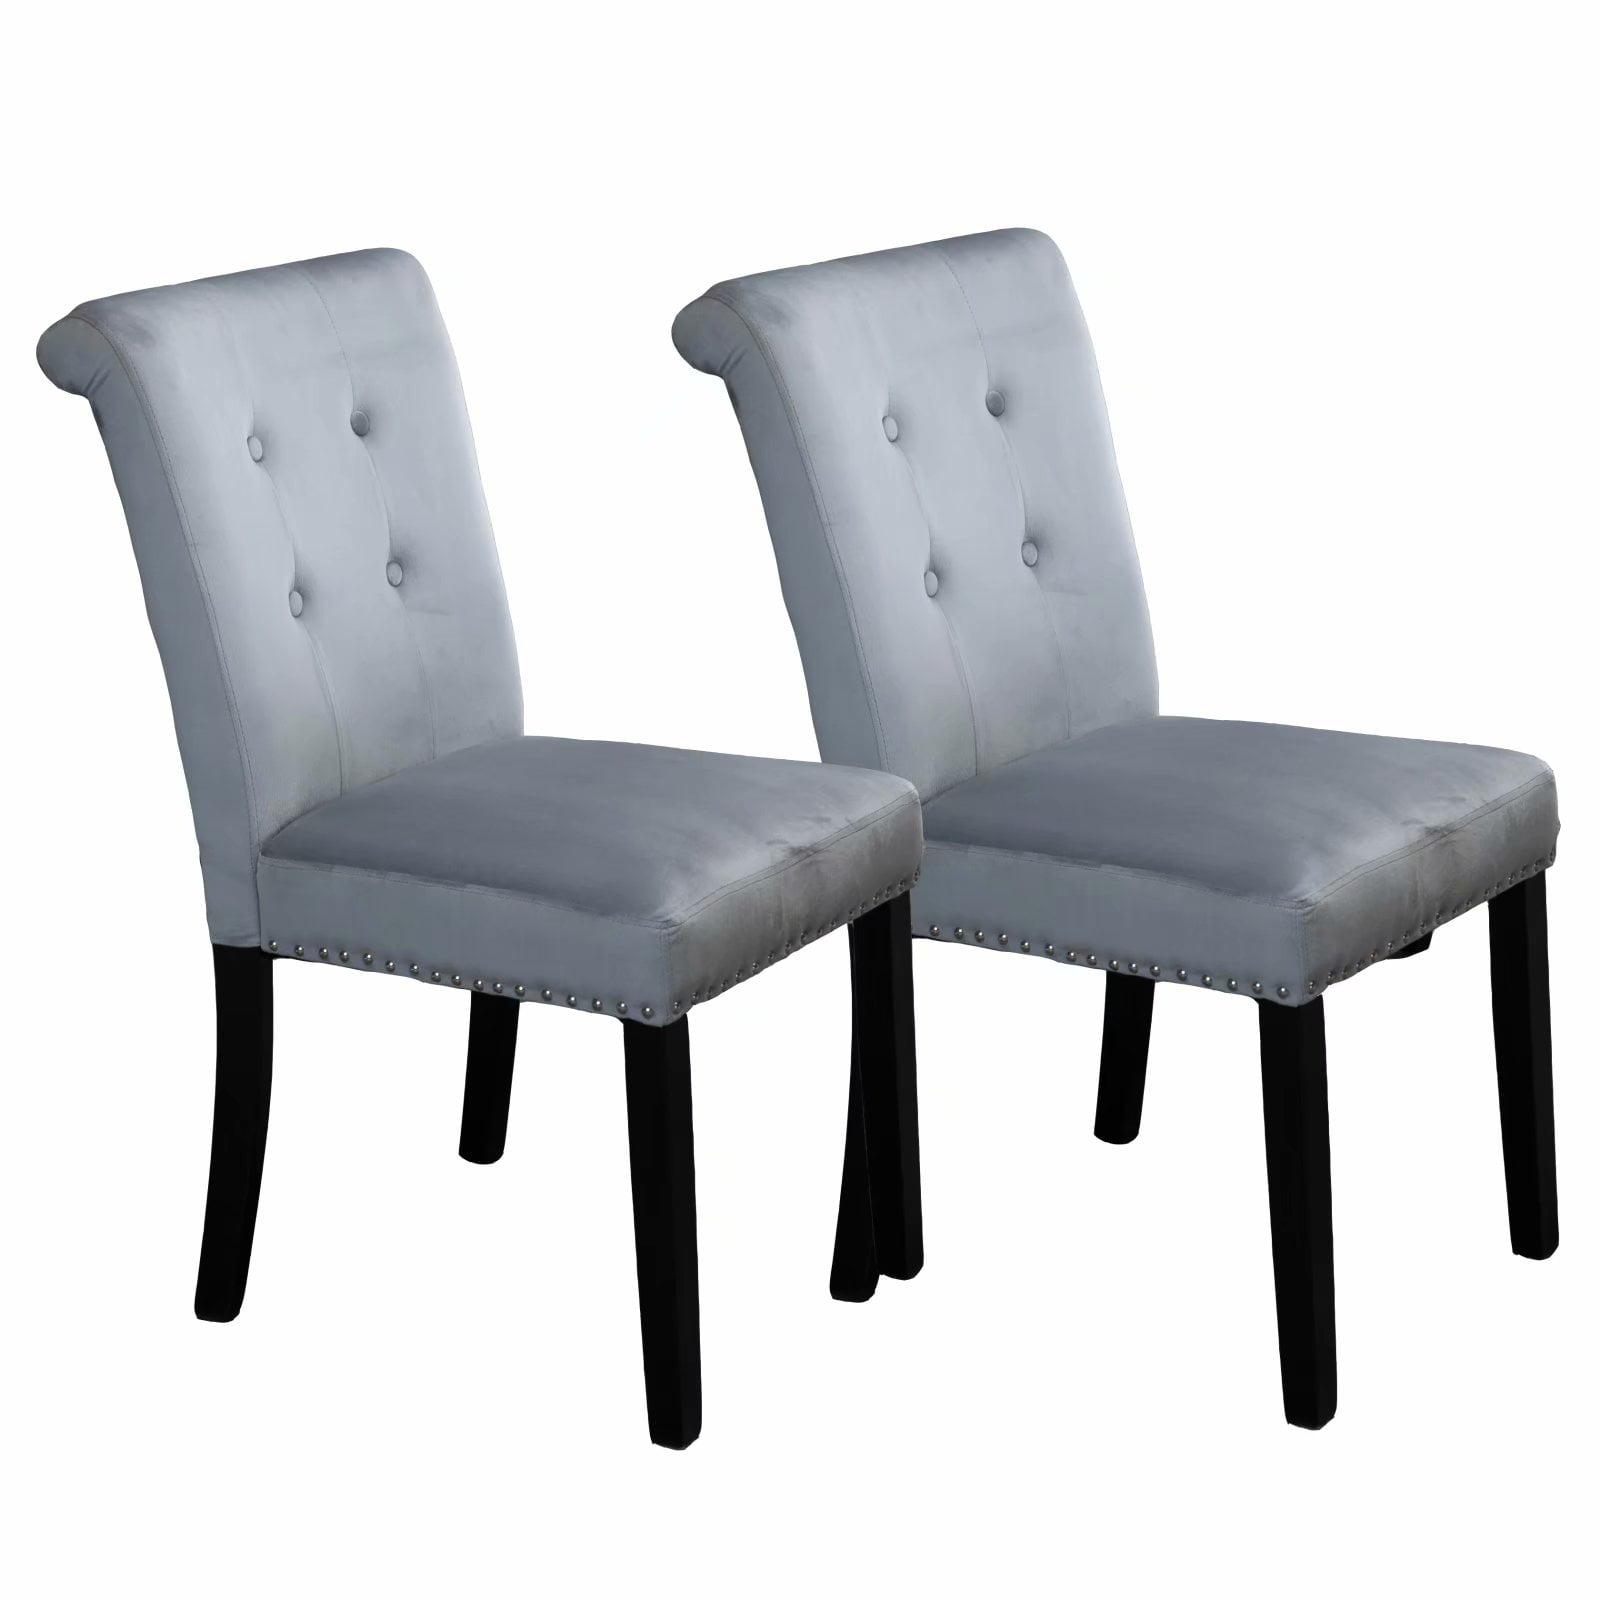 Jl Set Of 2 Vanity Chairs With Backs Velvet Fabric Vanity Chair Gray Walmart Com Walmart Com